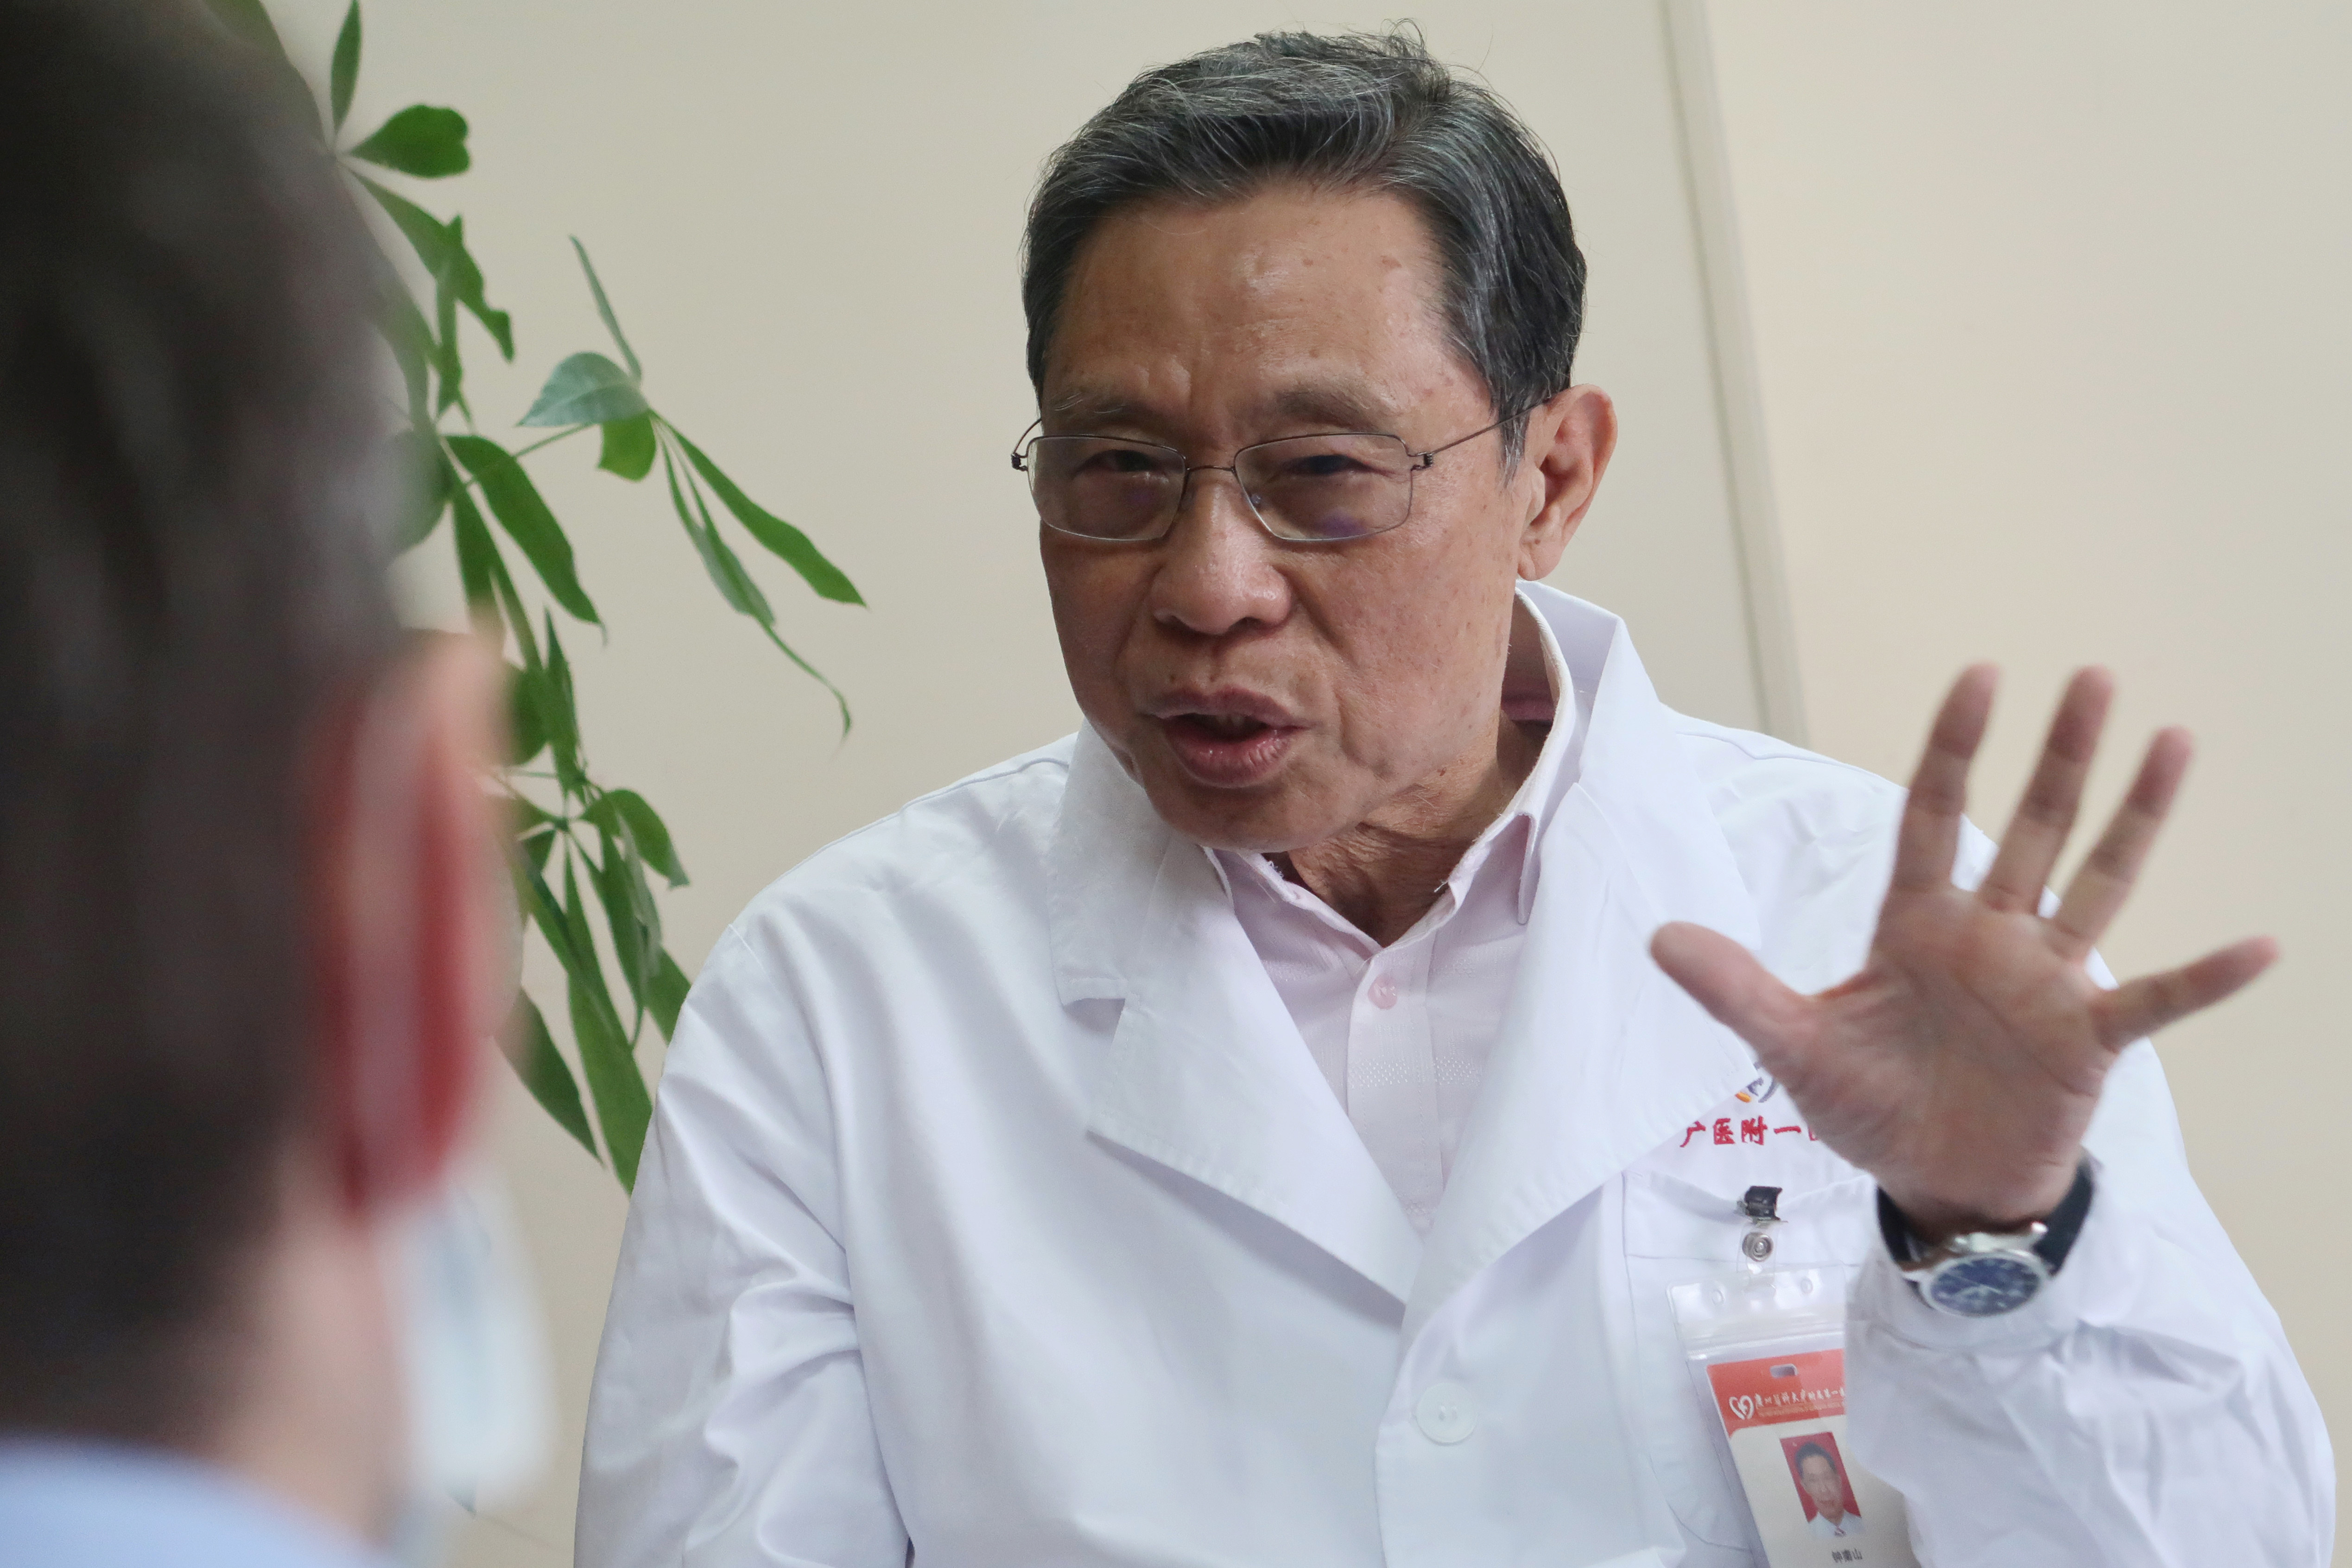 coronavirus-zhong-nanshan-epidemiologiste-sras-chine